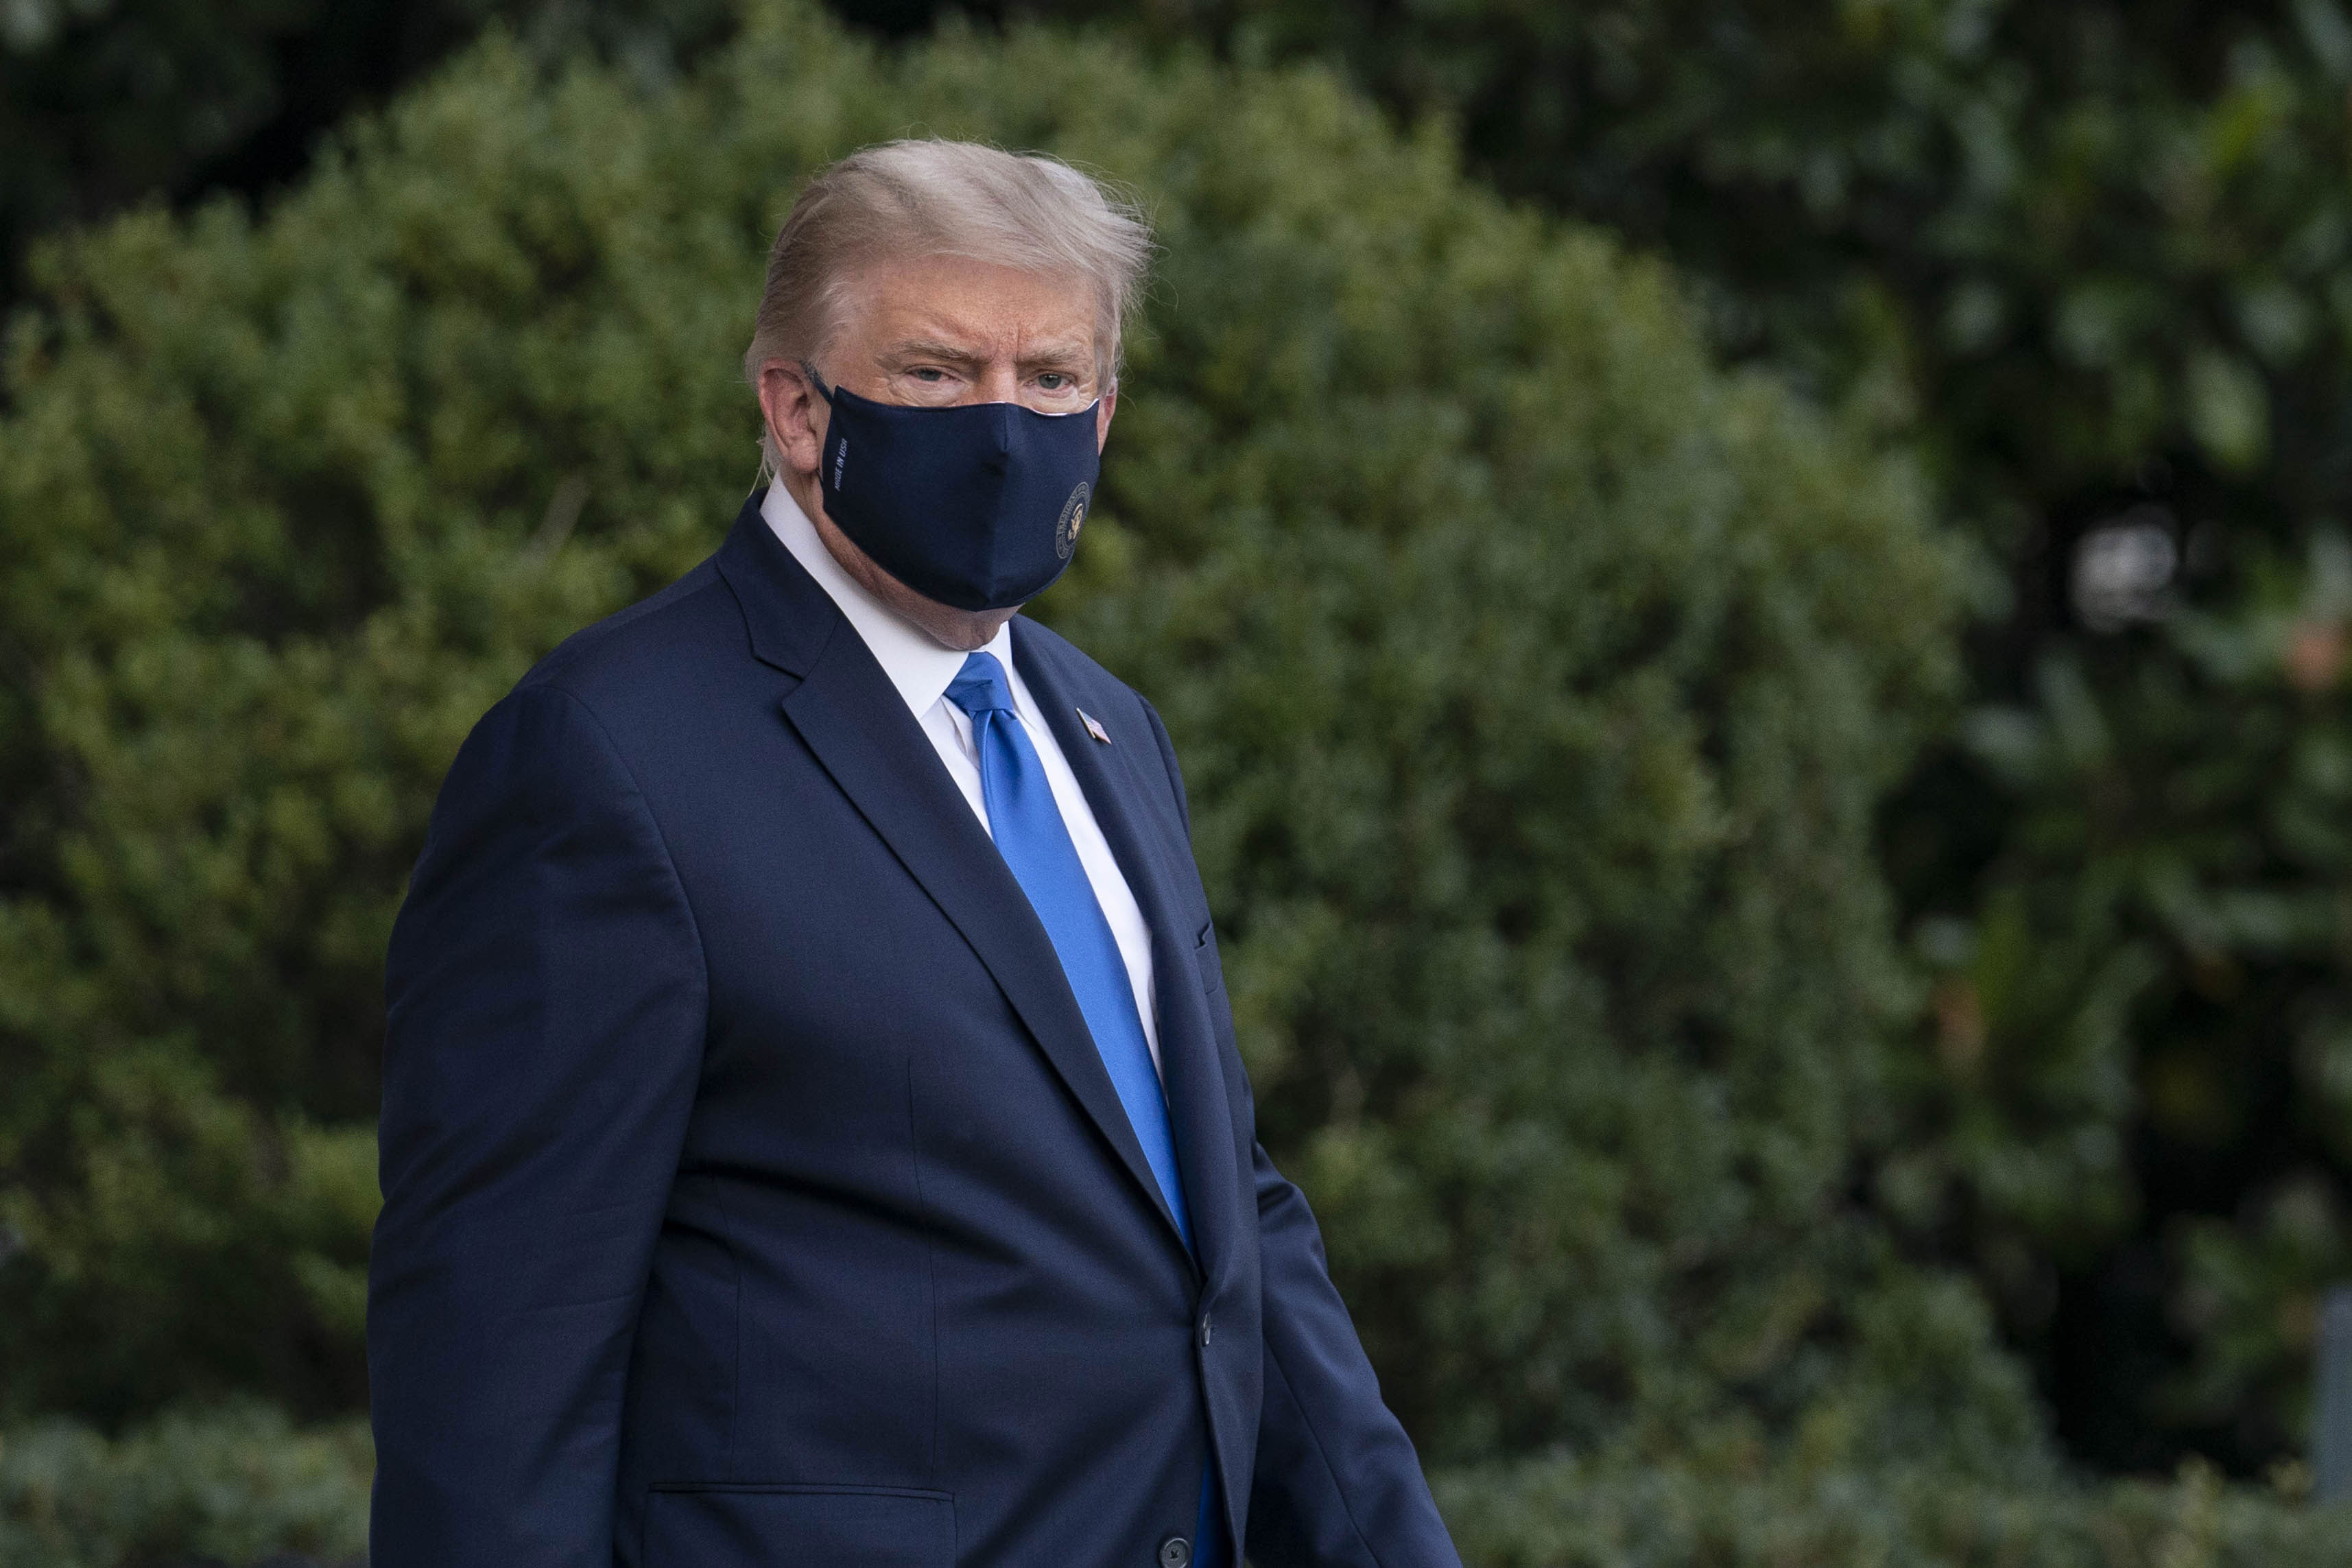 The latest on Trump's Covid-19 diagnosis